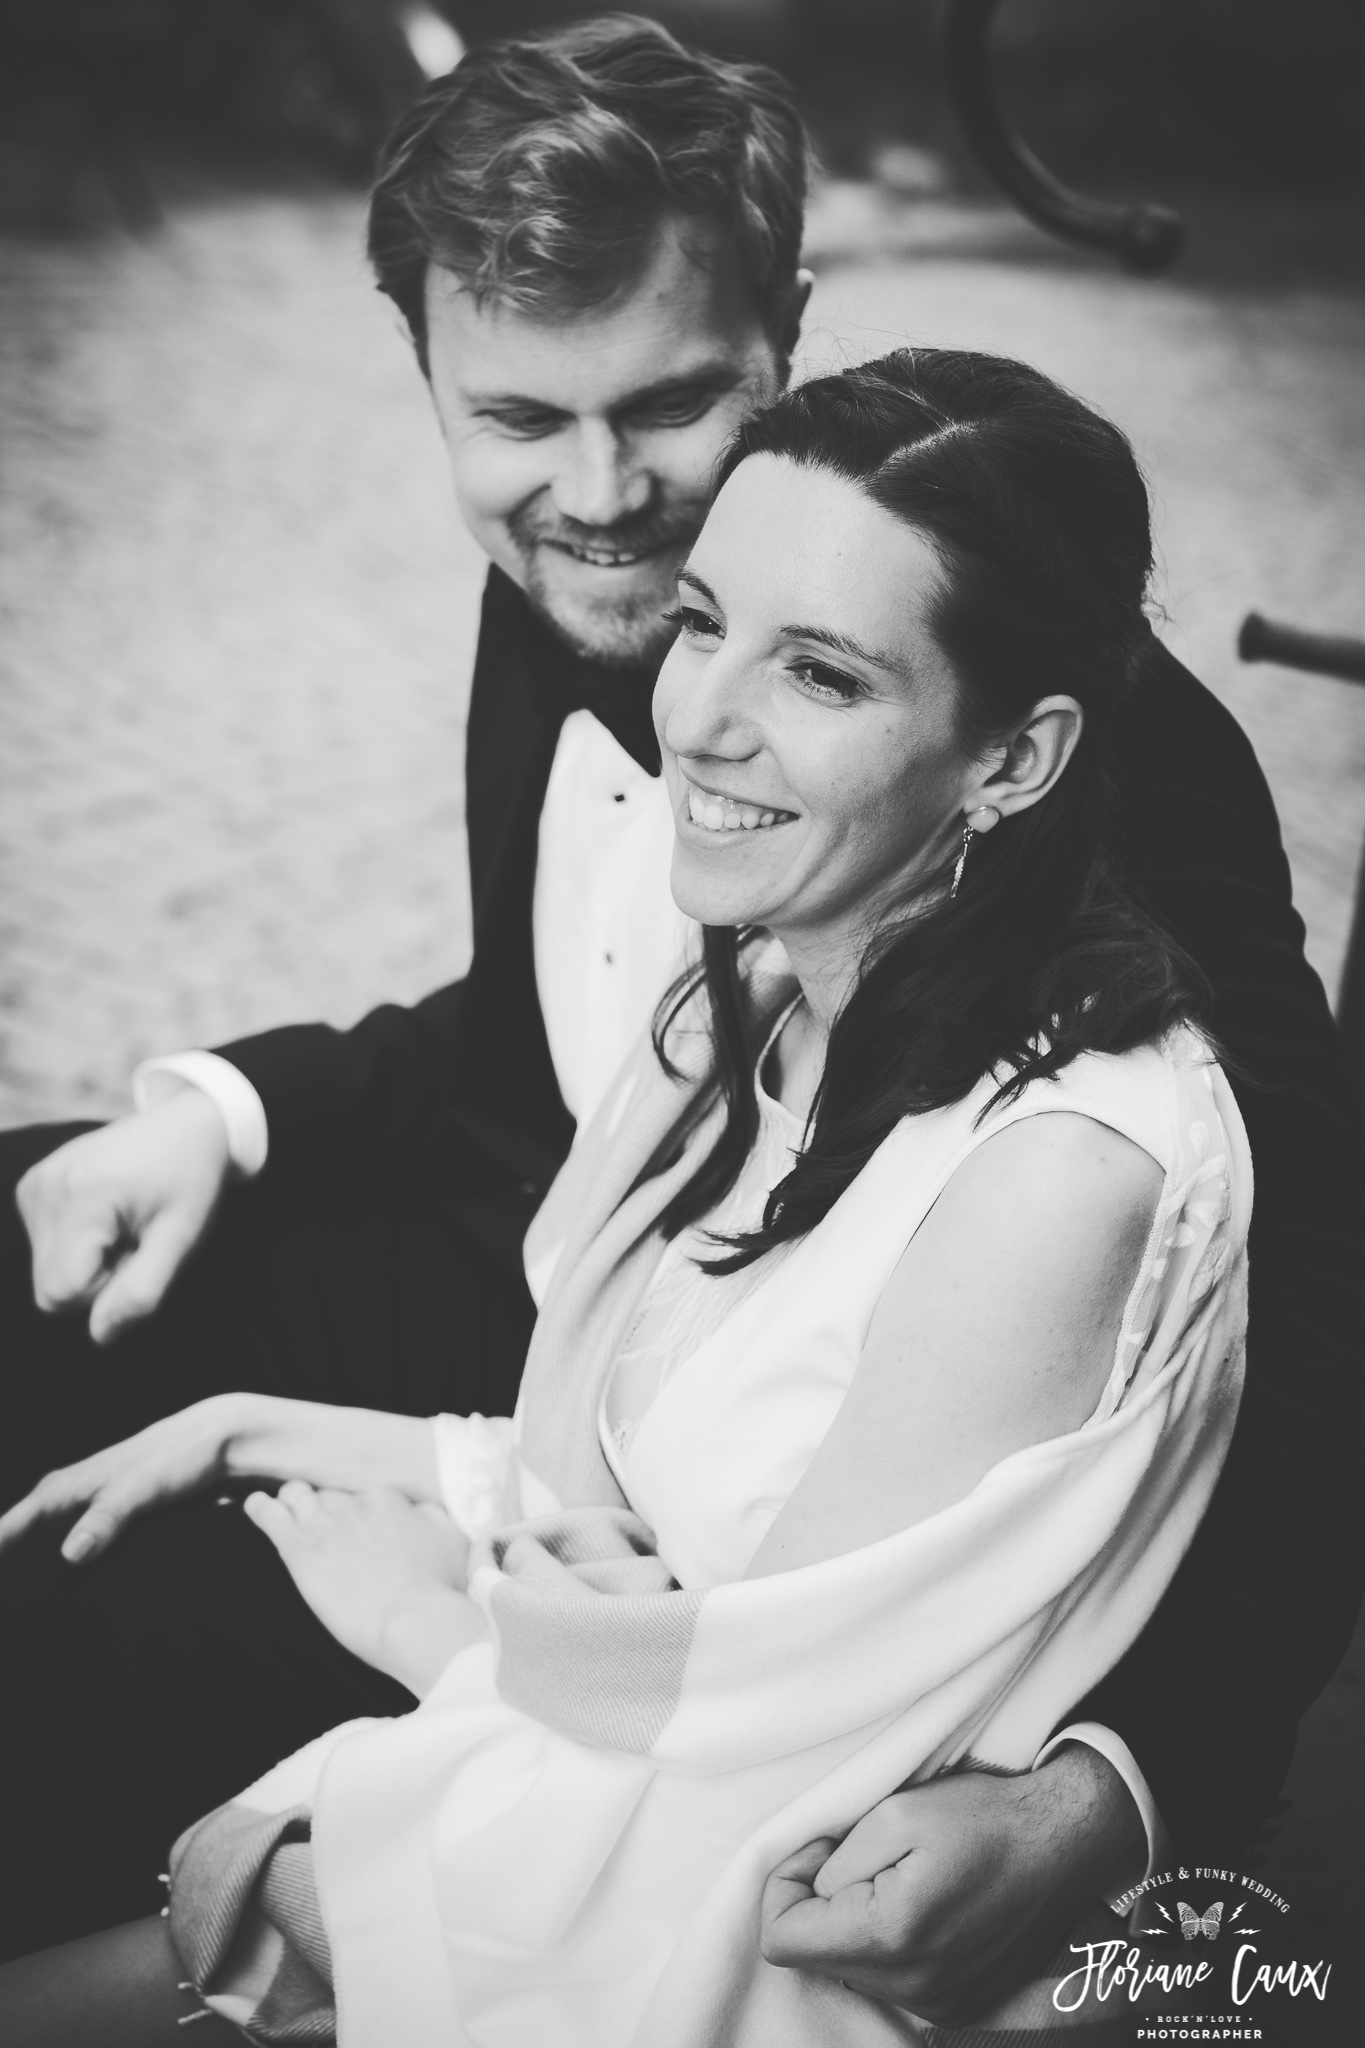 destination-wedding-photographer-oslo-norway-floriane-caux-24